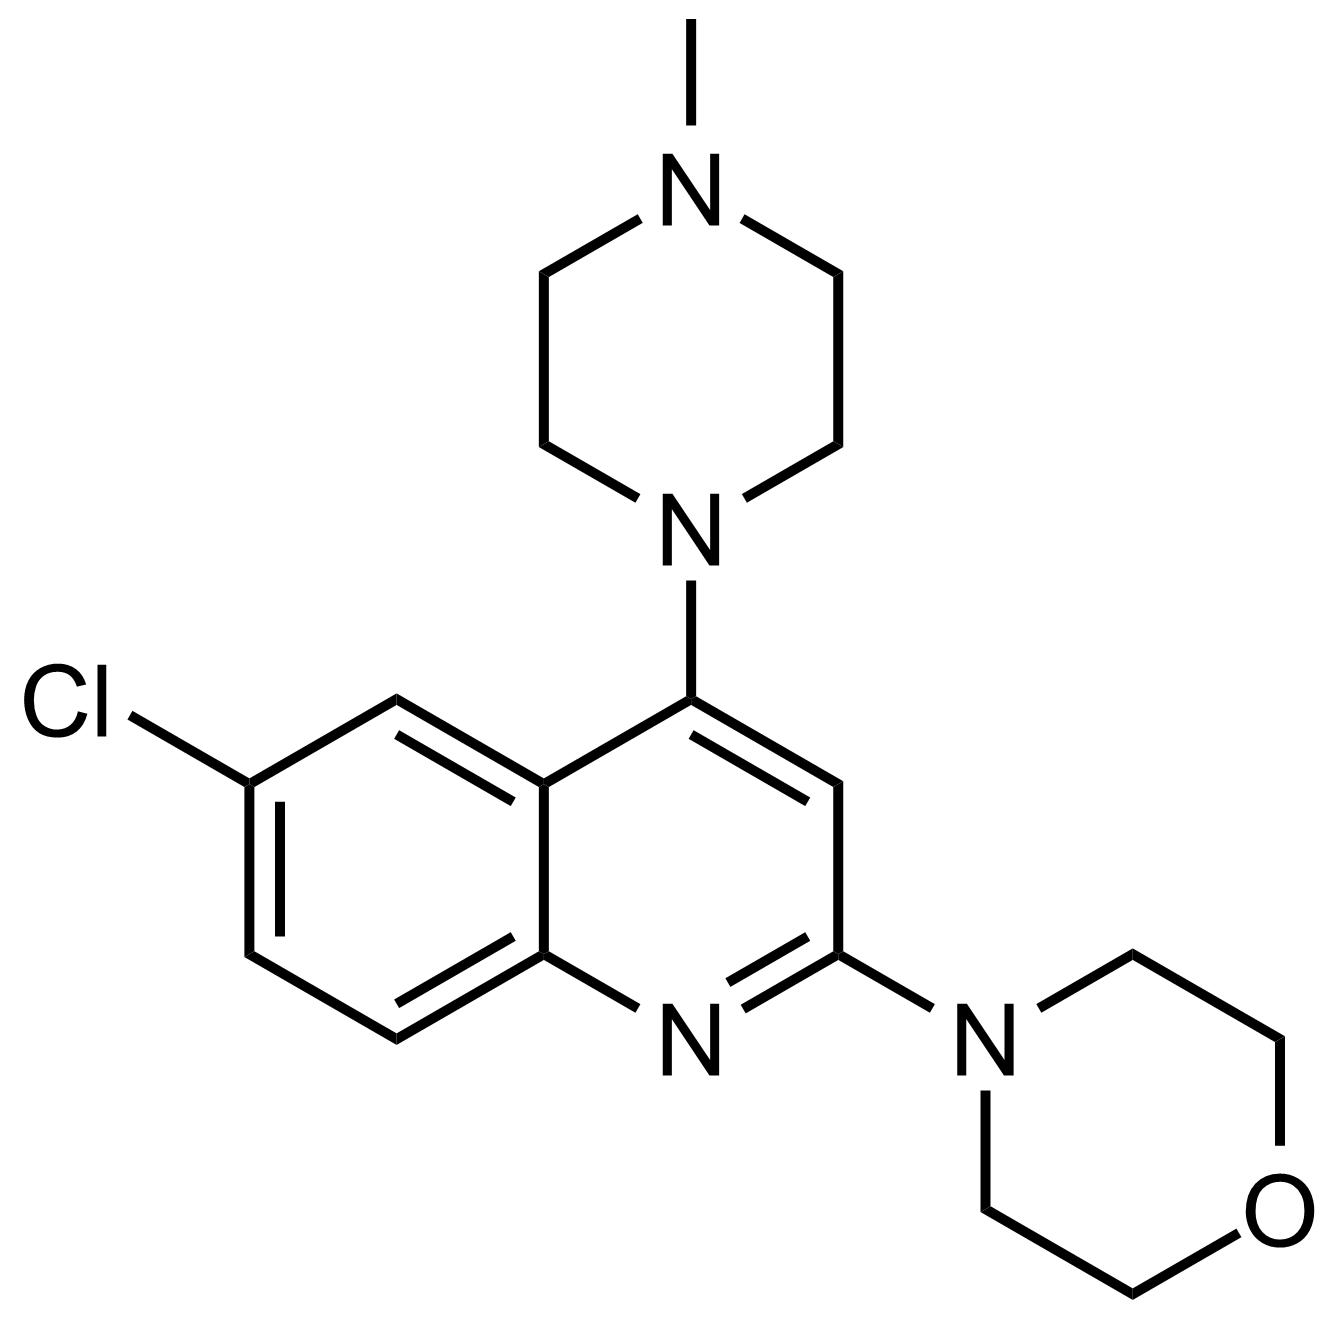 Structure of 4-(6-Chloro-4-(4-methylpiperazin-1-yl)quinolin-2-yl)morpholine